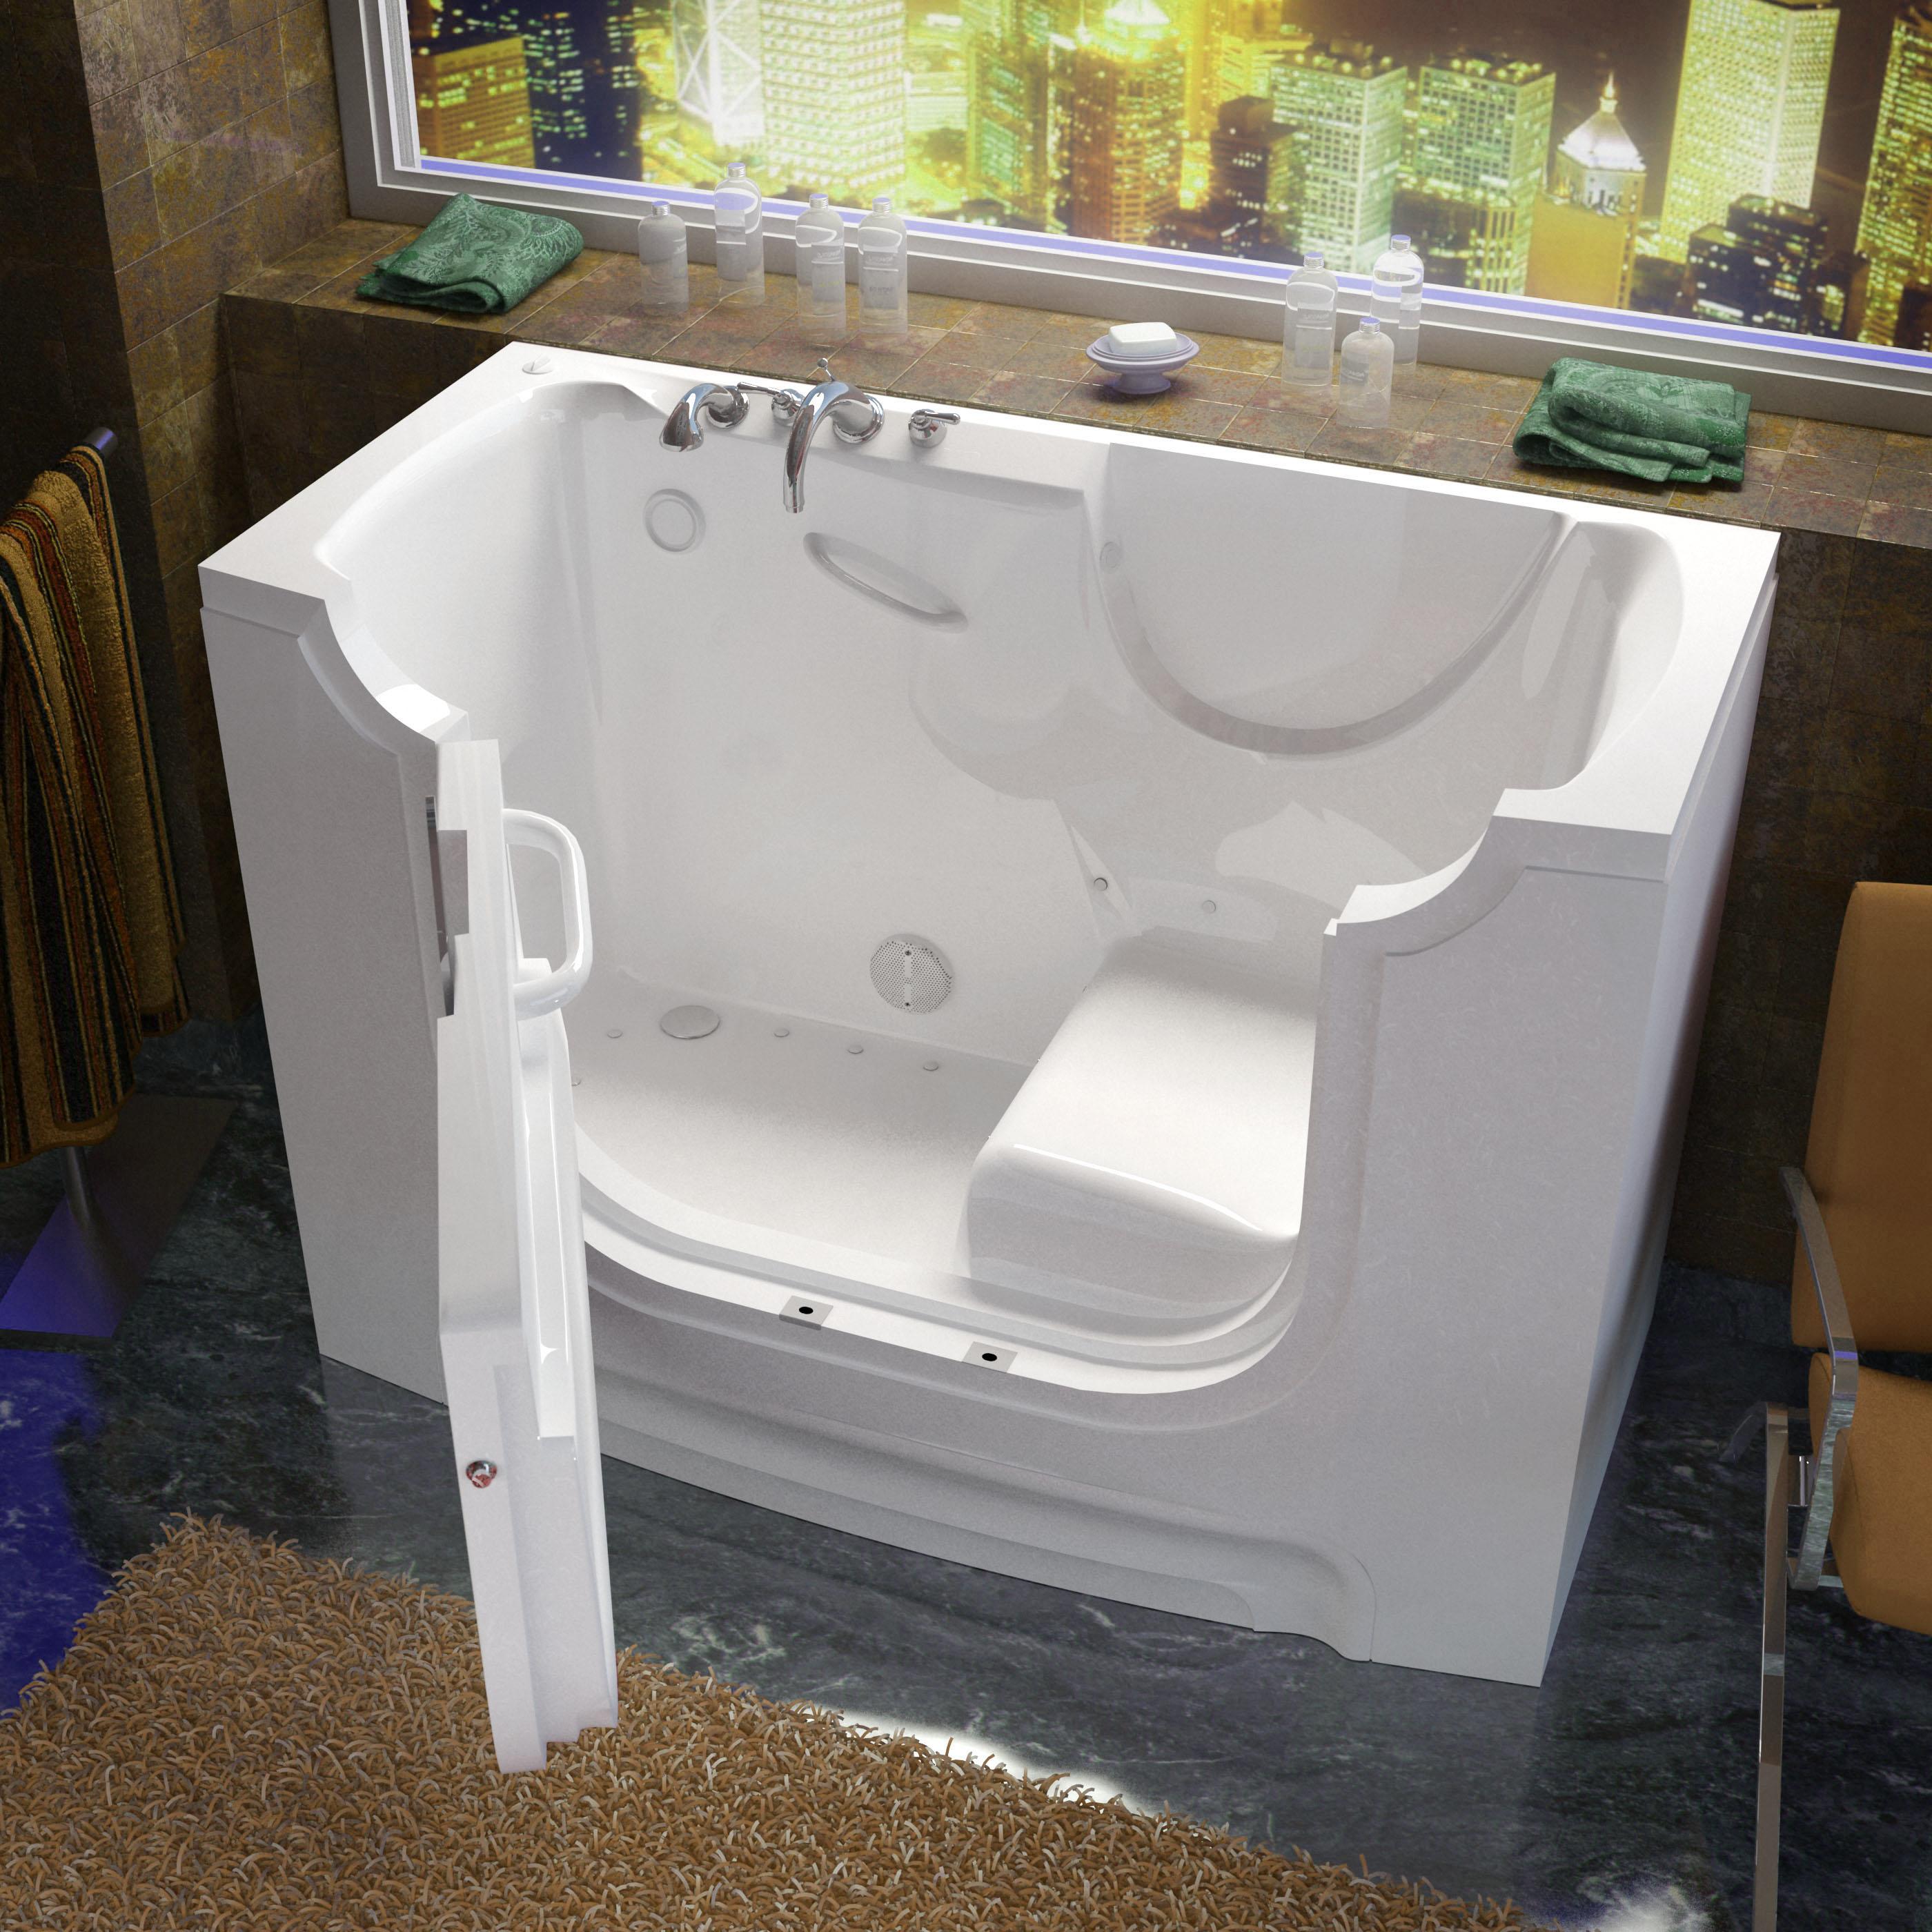 30x60 Left Drain White Air Jetted Wheelchair Accessible Walk-In Bathtub